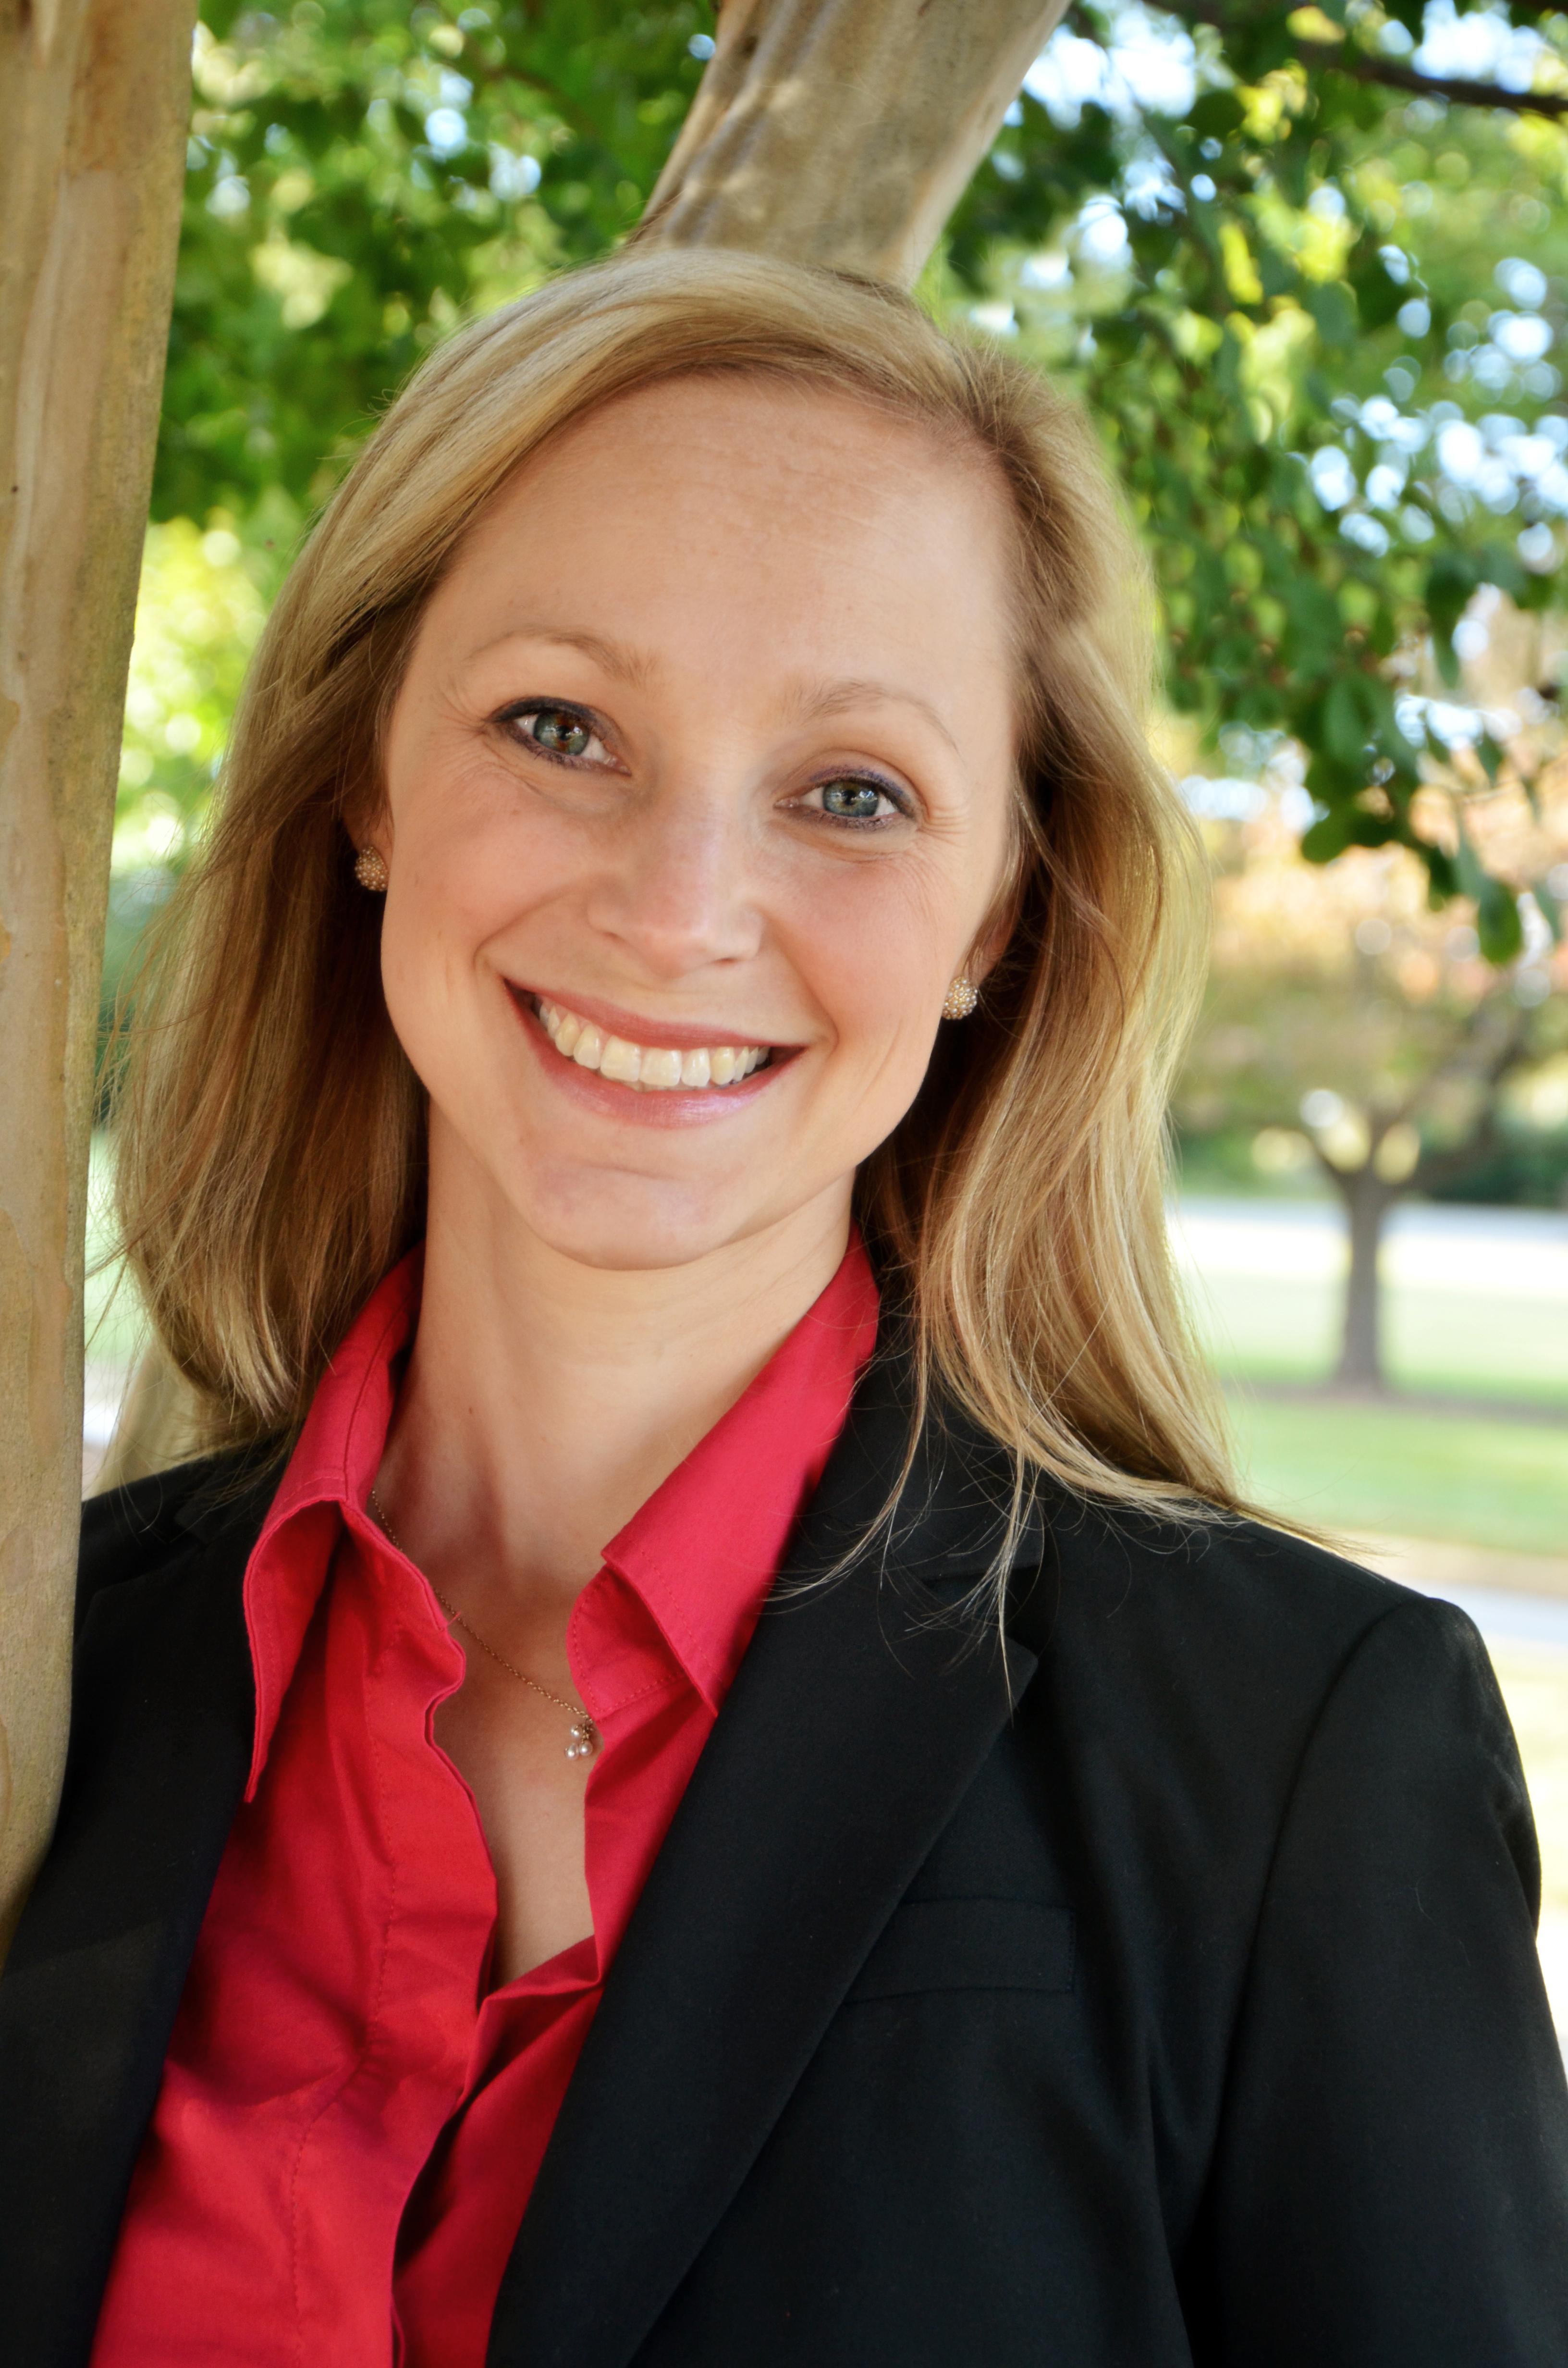 Meredith Edwards, Clerk of Court